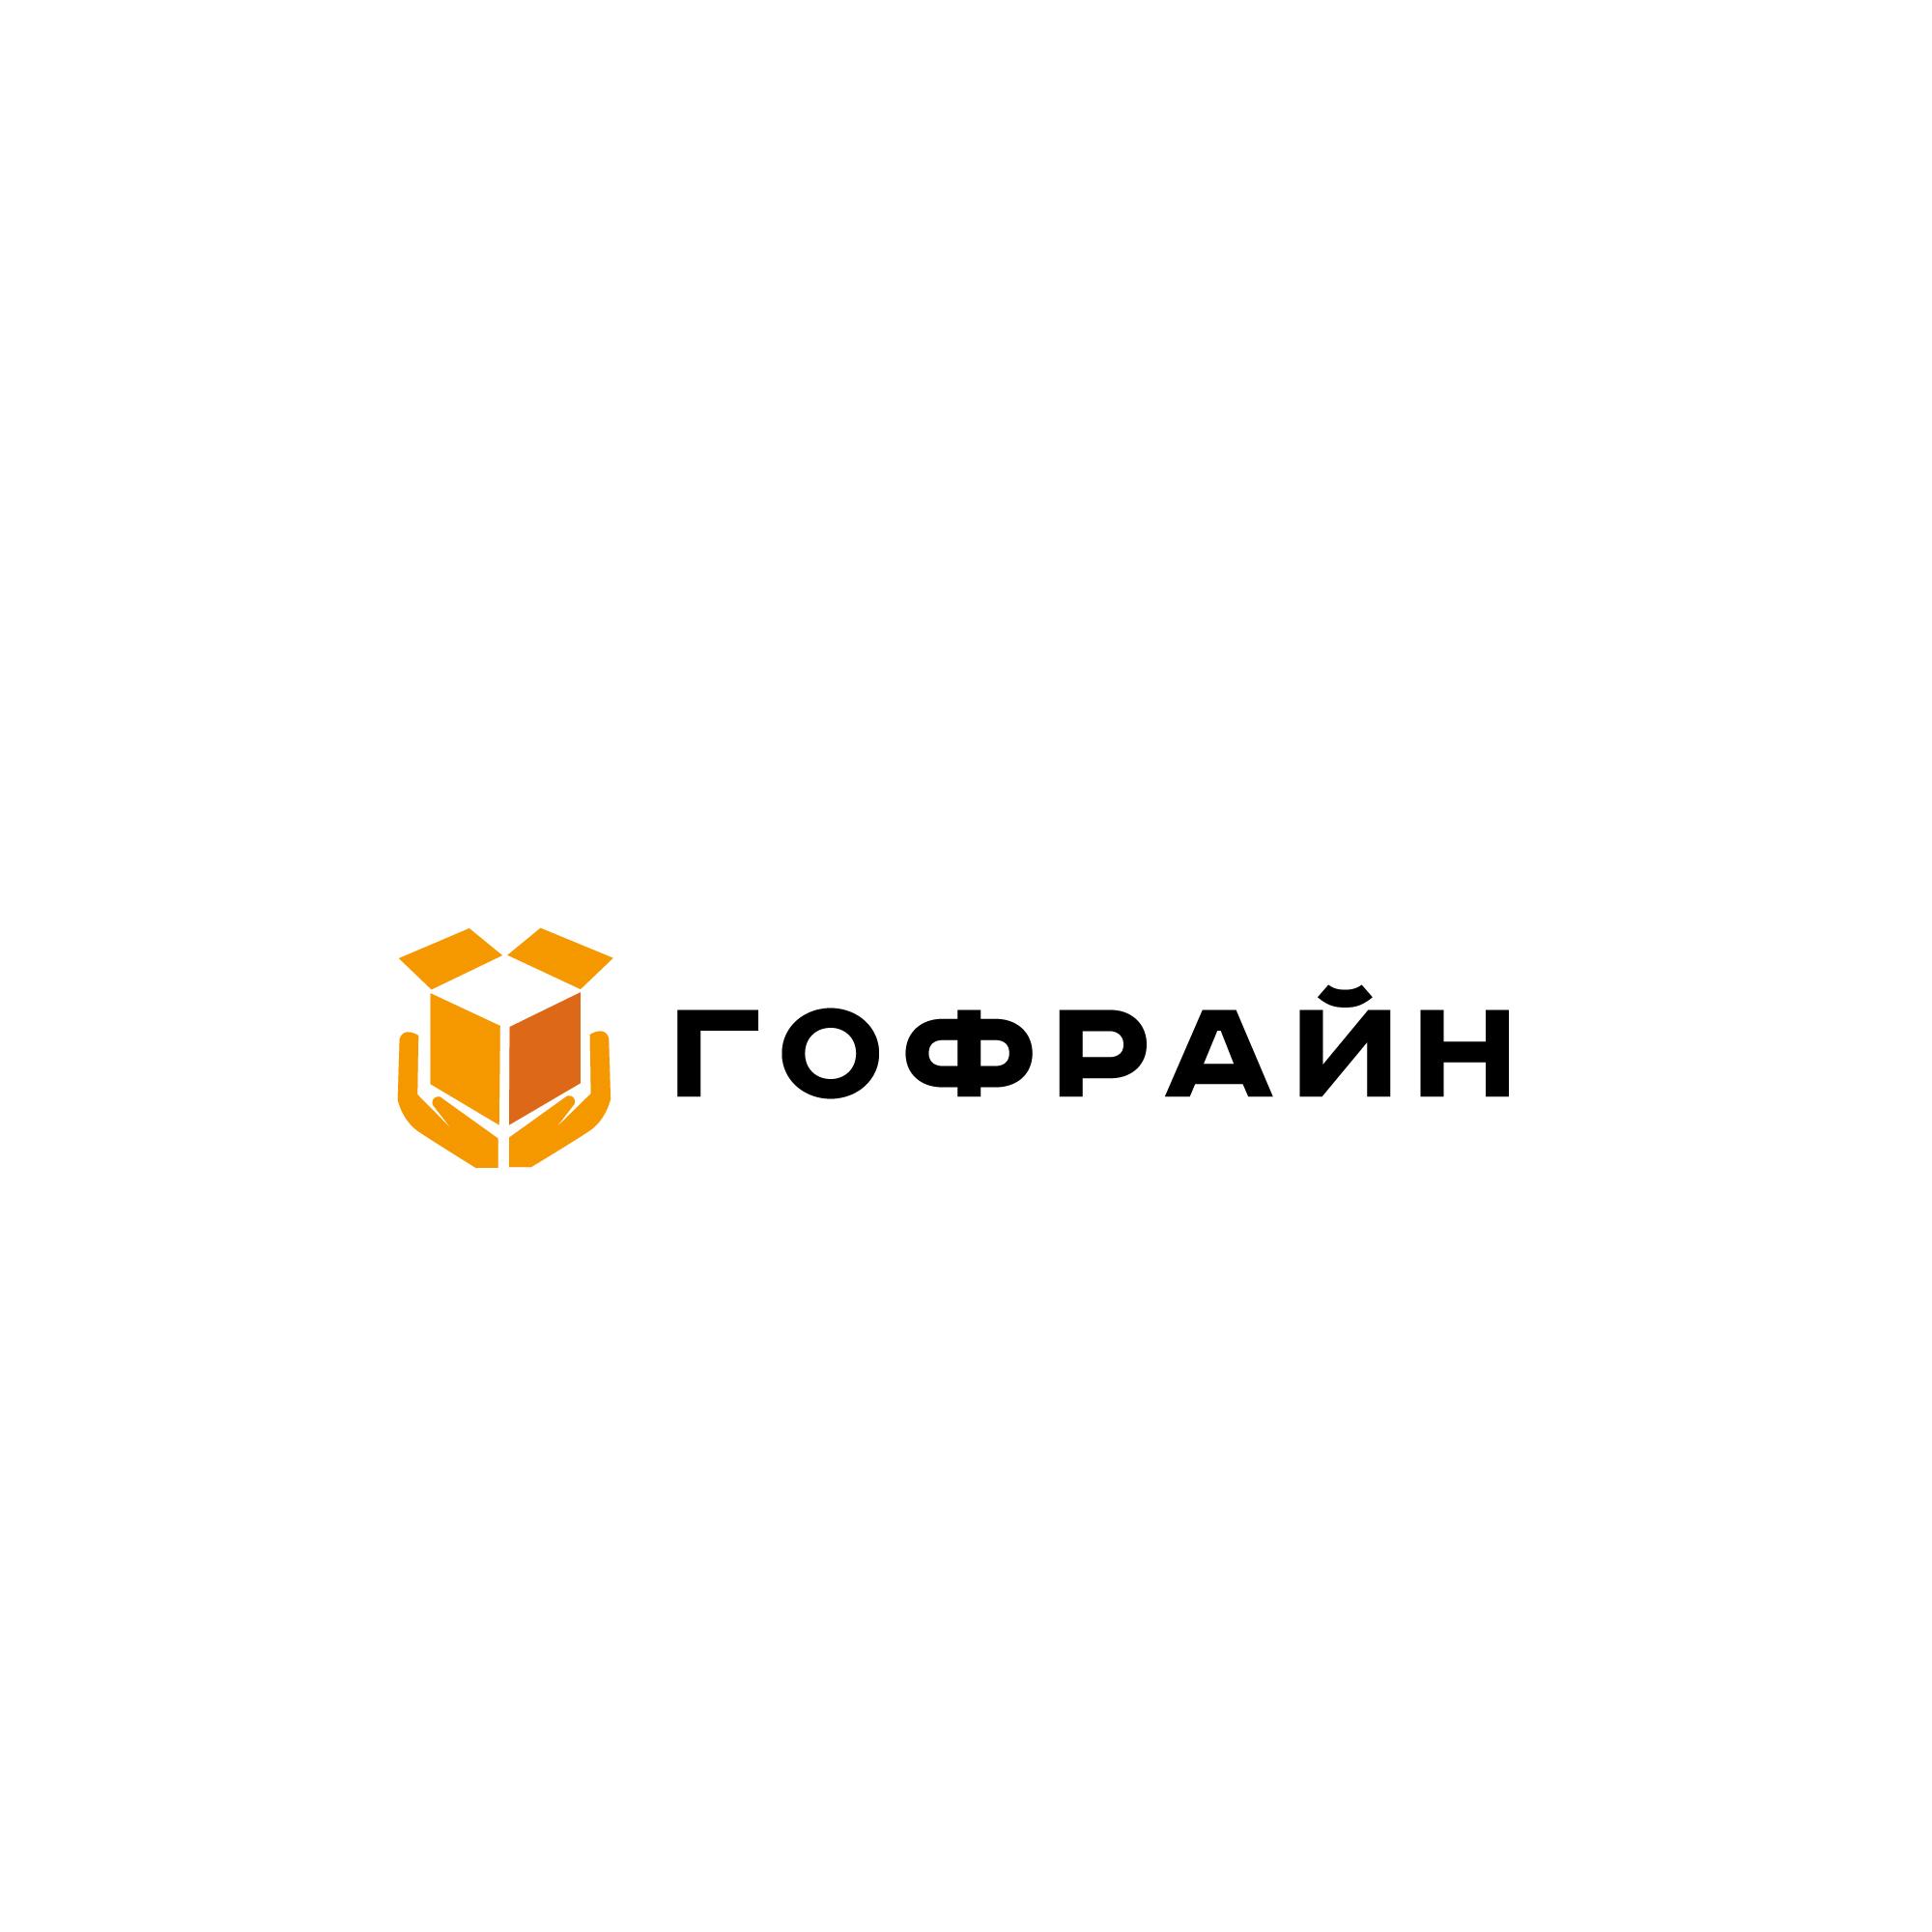 Логотип для компании по реализации упаковки из гофрокартона фото f_6285ce271c2cad4a.jpg